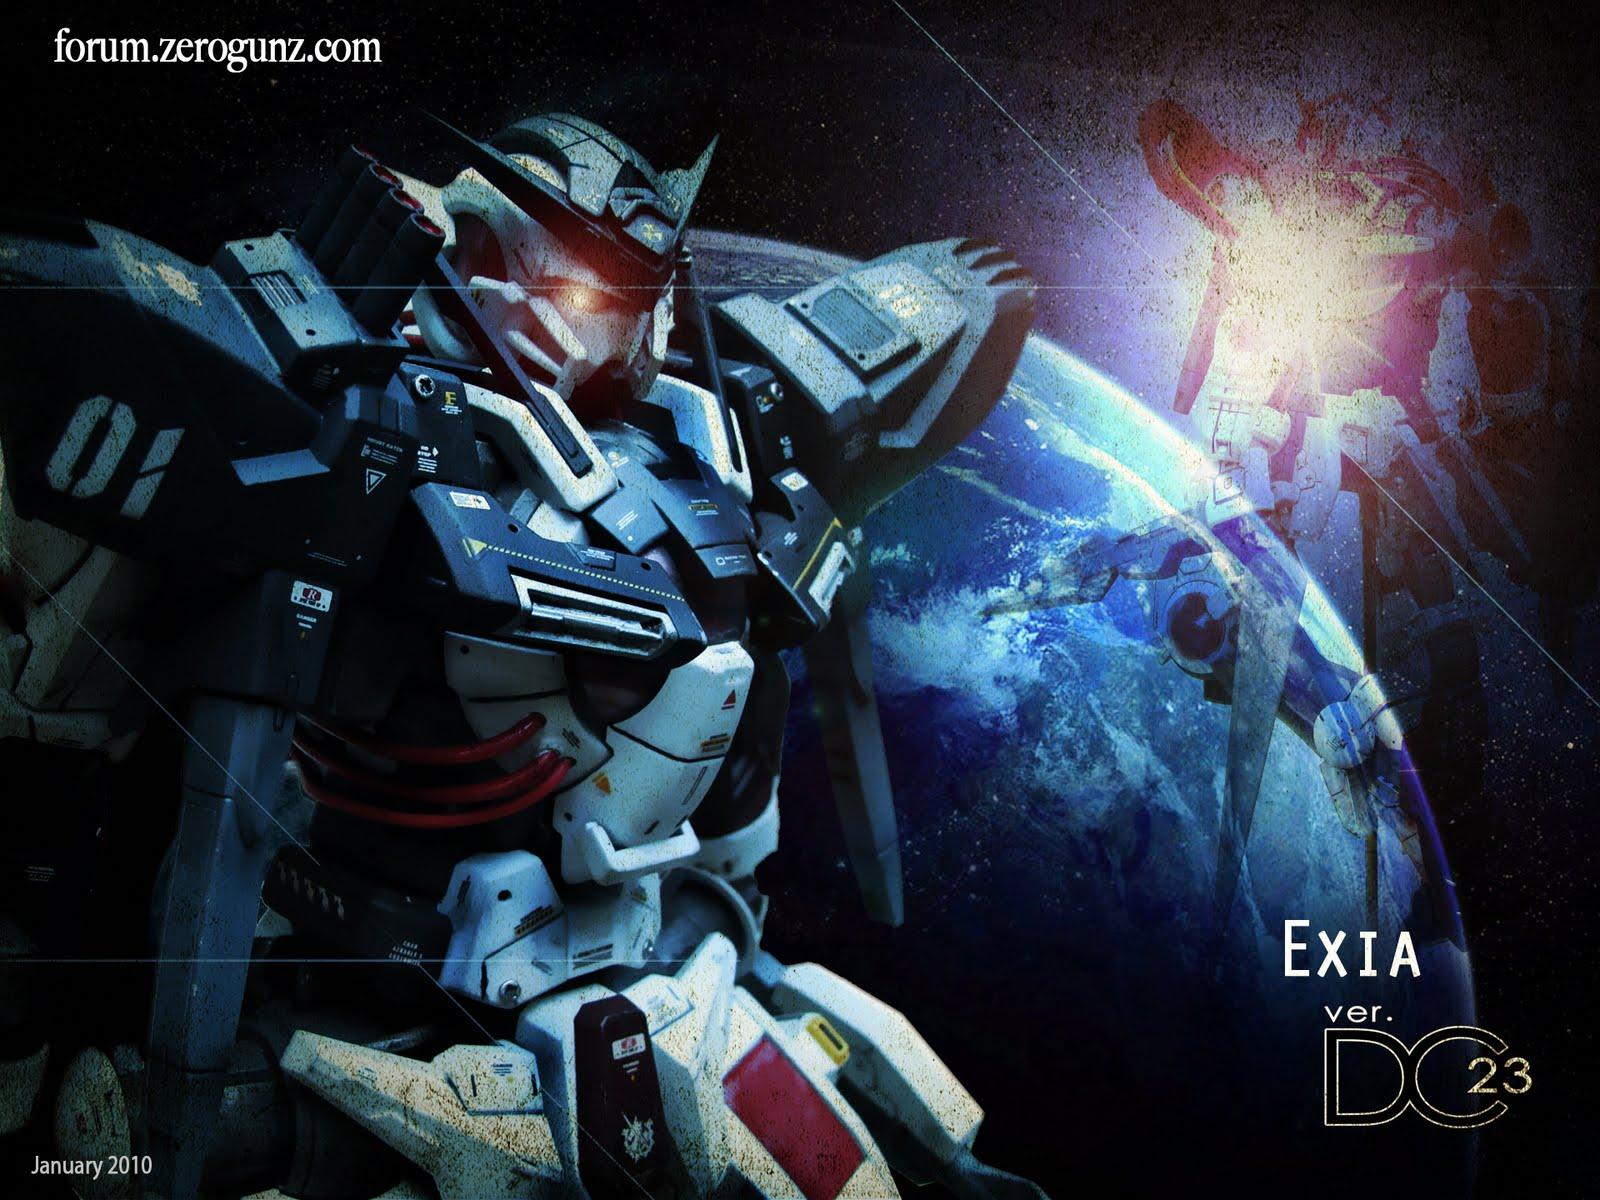 Exia wallpaper DC23 1600x1200